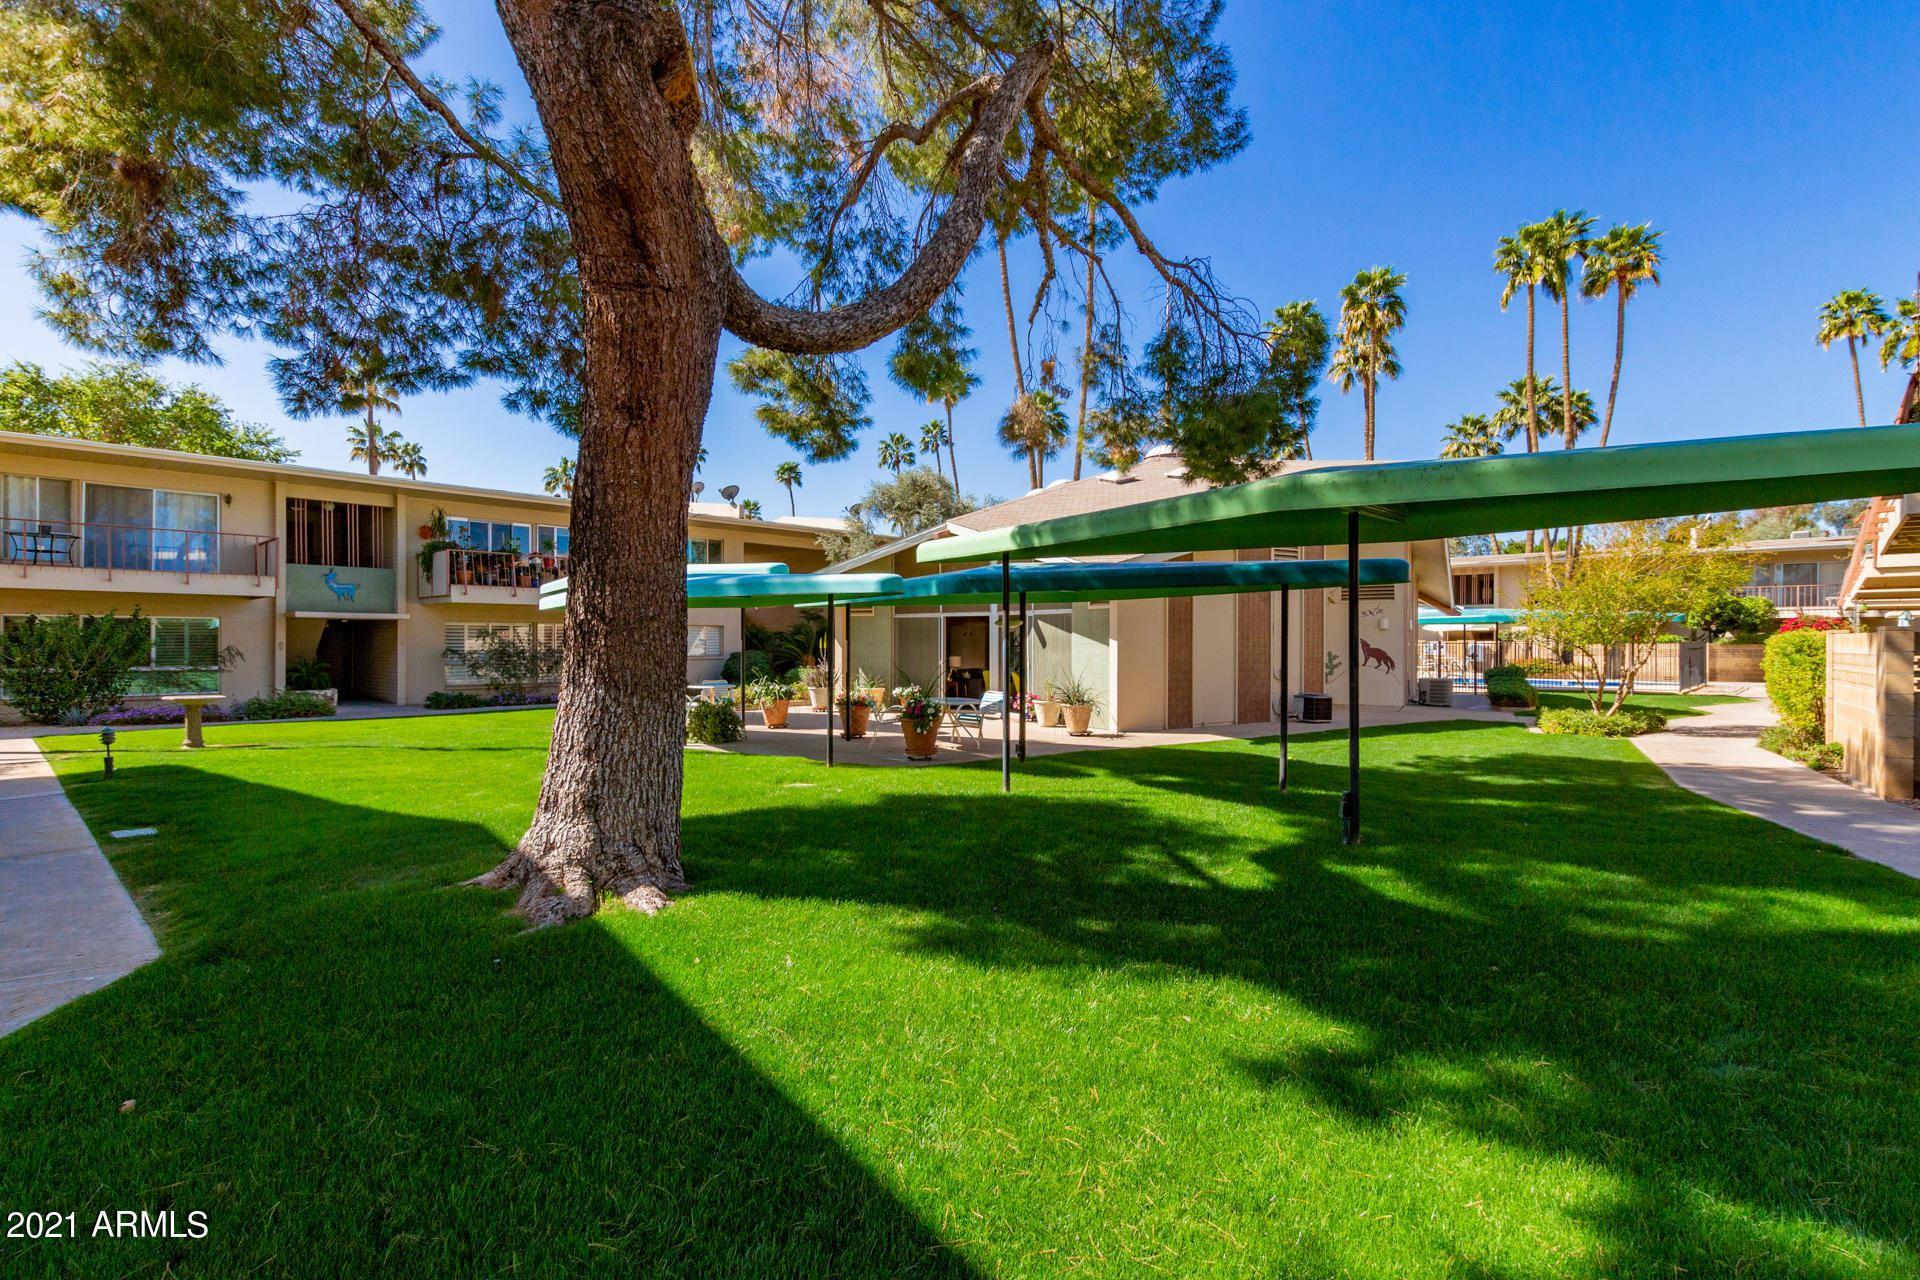 520 W CLARENDON Avenue #E8, Phoenix, AZ 85013 - MLS#: 6208981